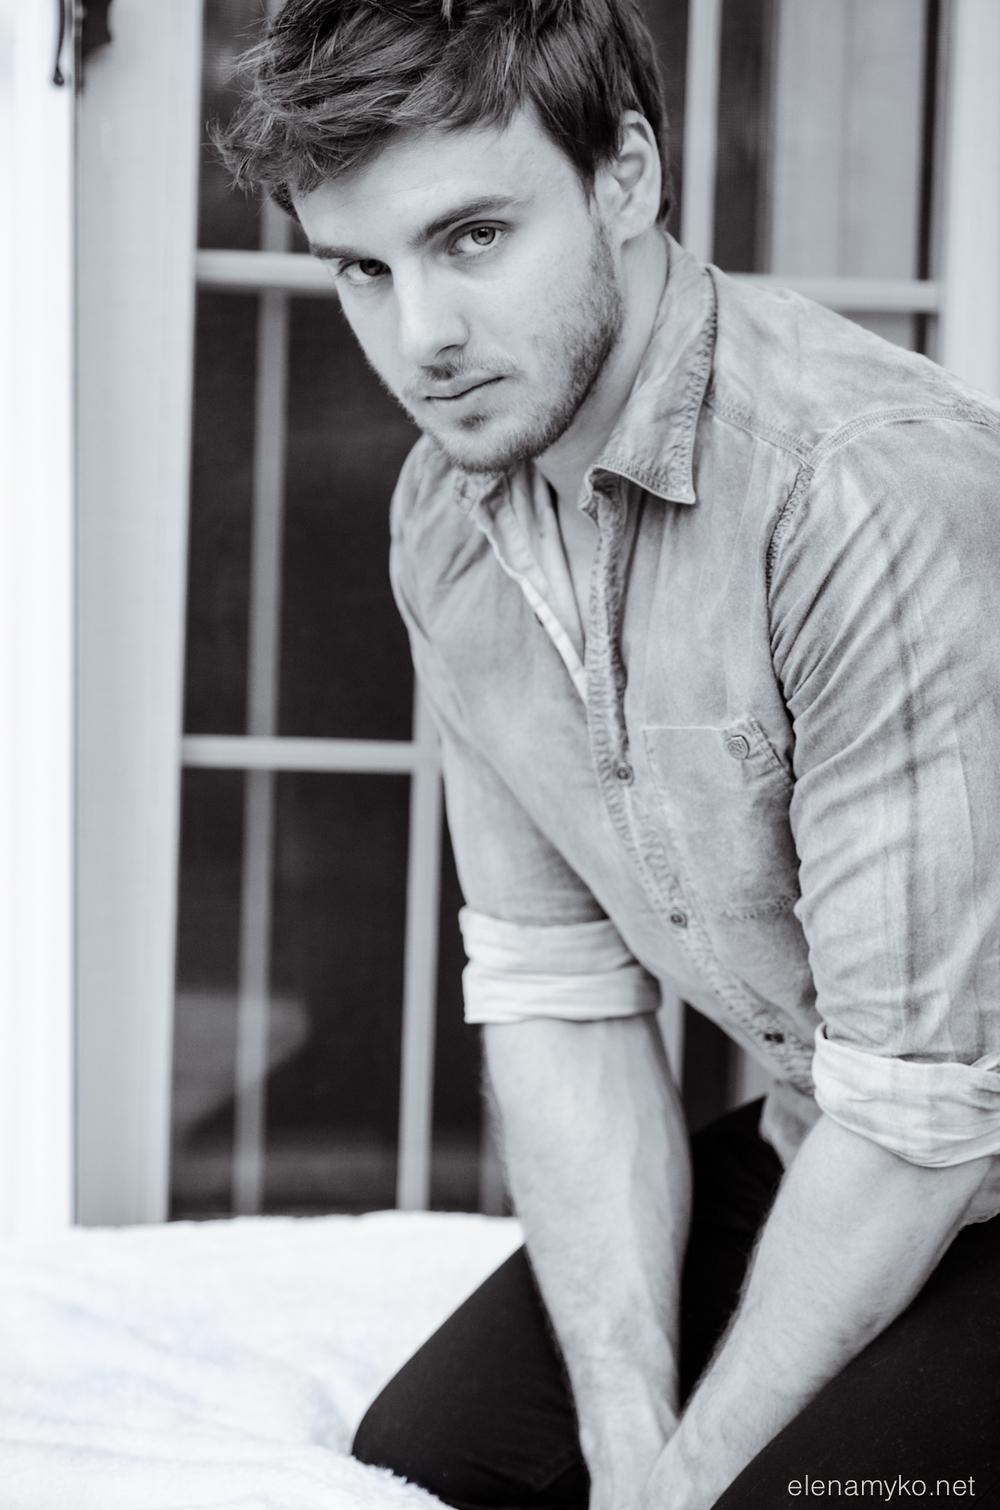 Kirill S., Model